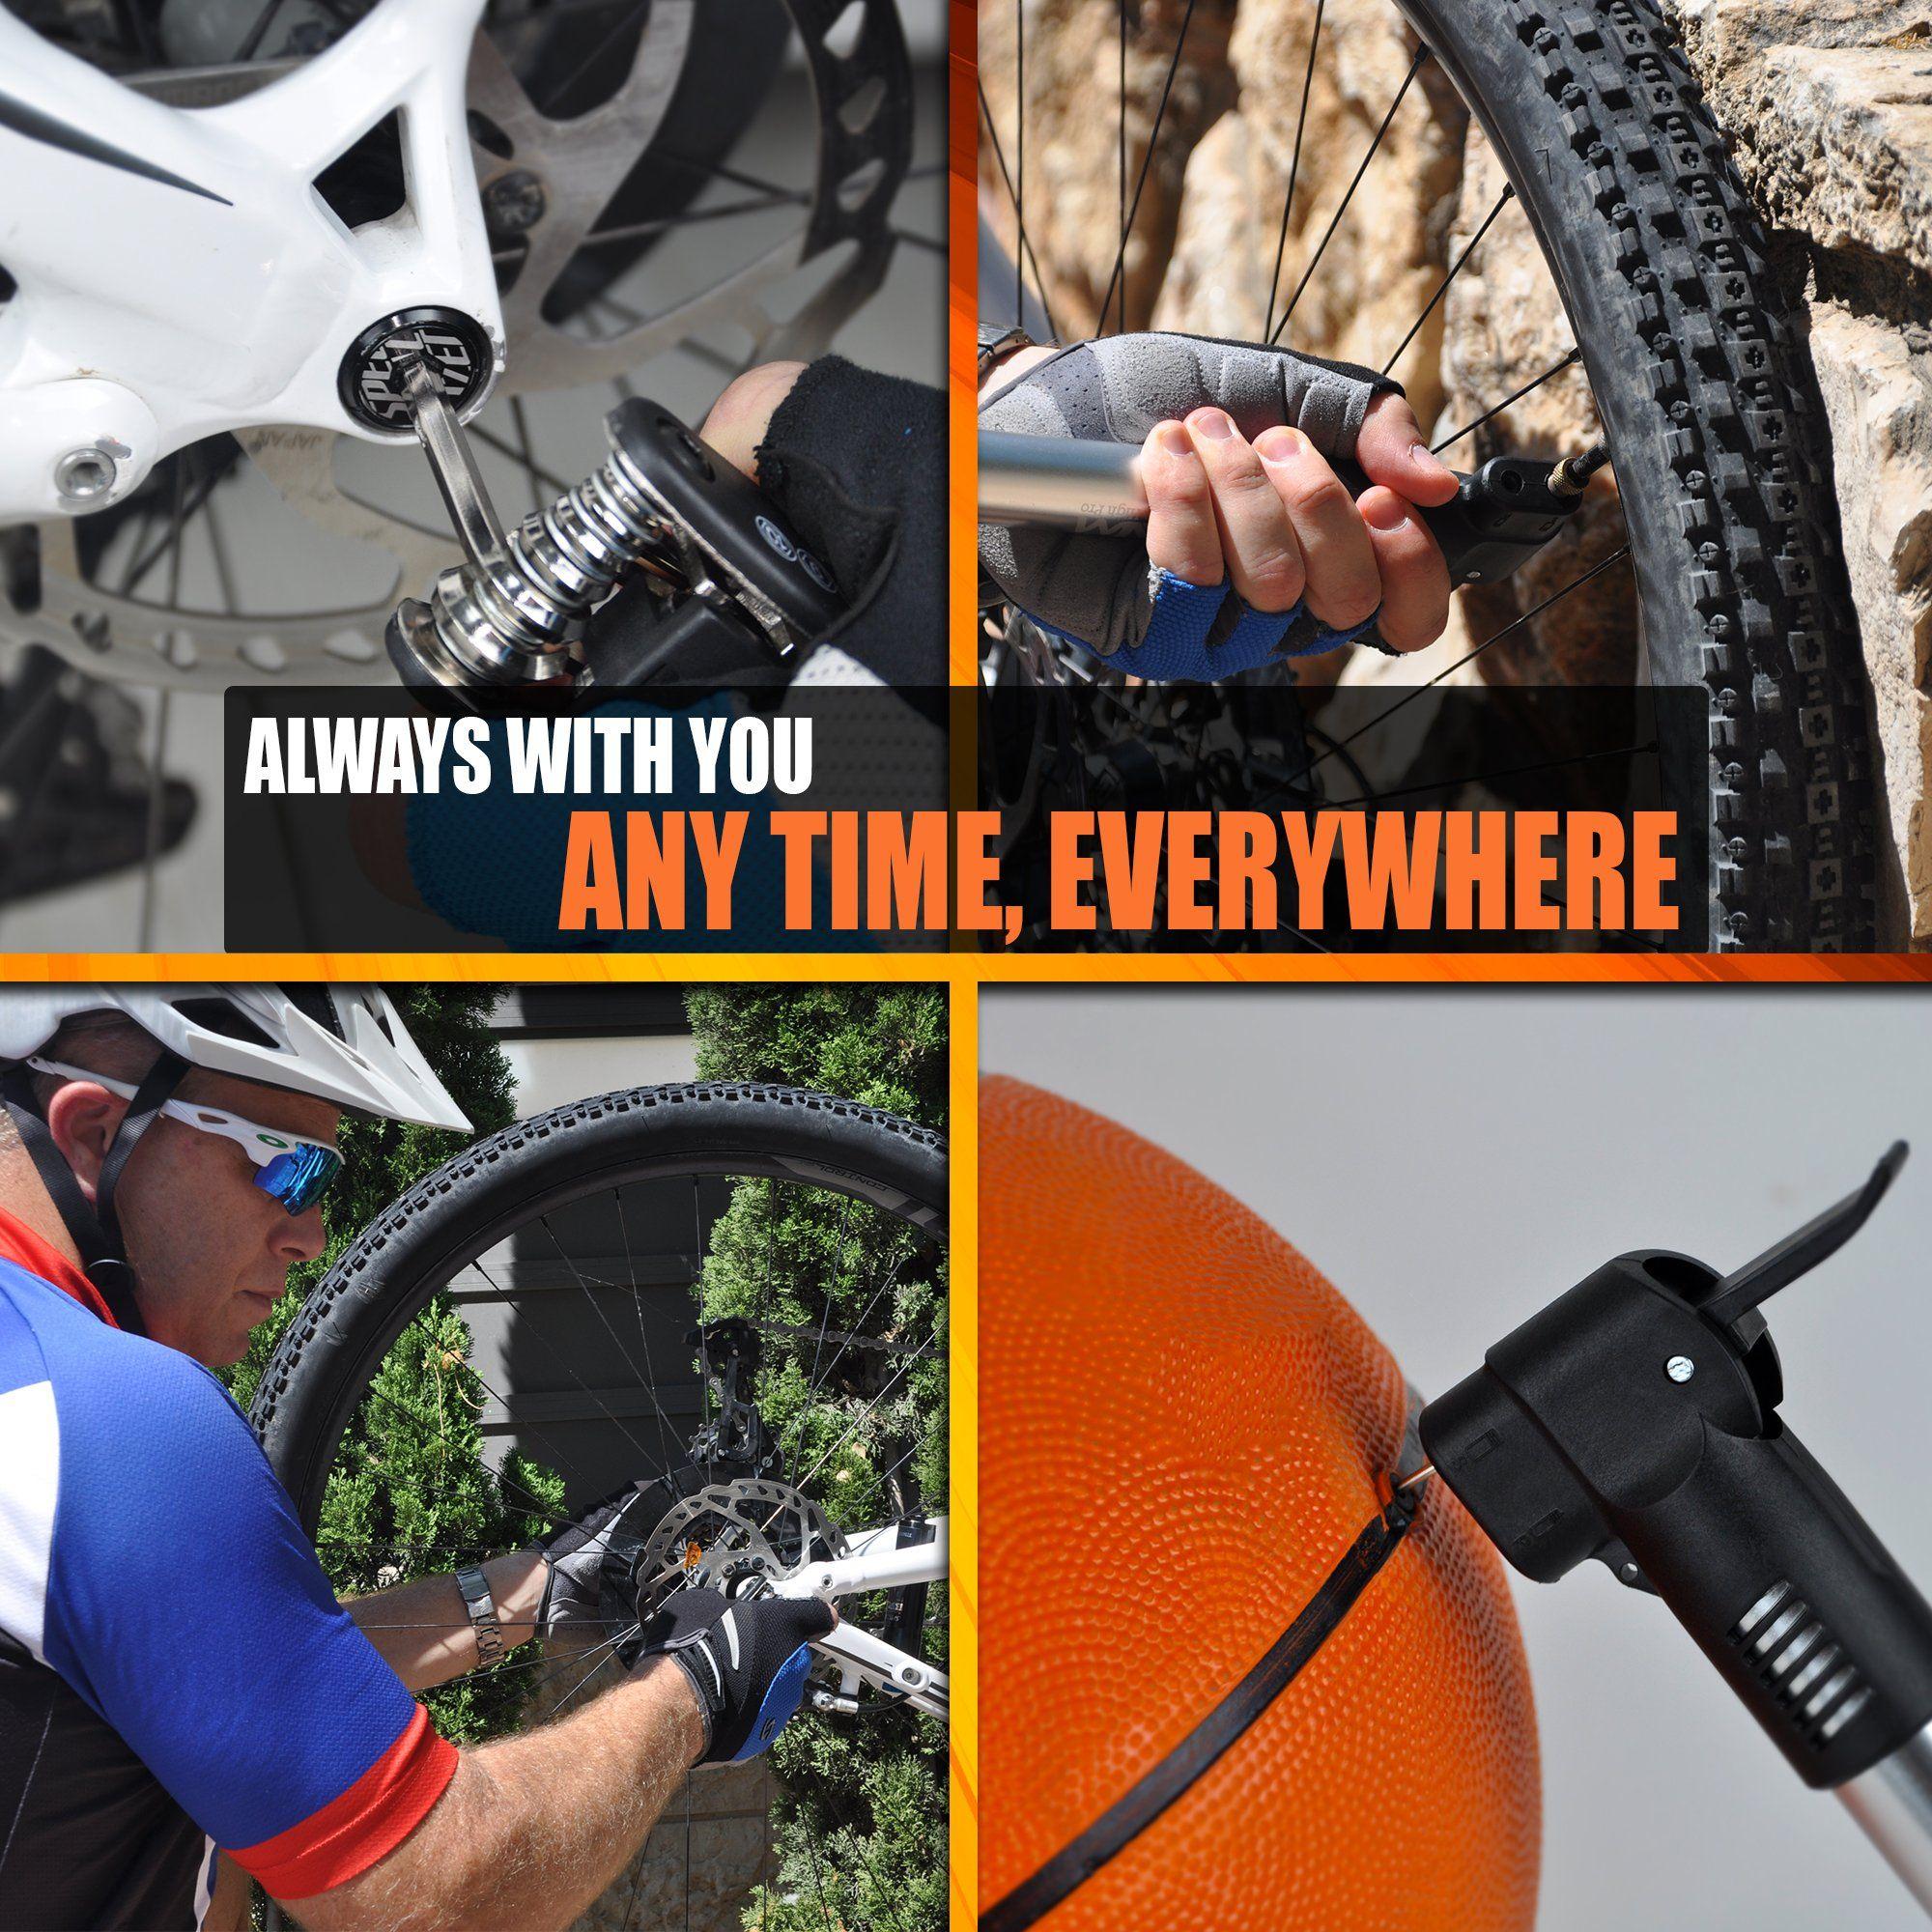 Aim High Pro Portable Frame Mount Mini Bike Pump Fits Presta And